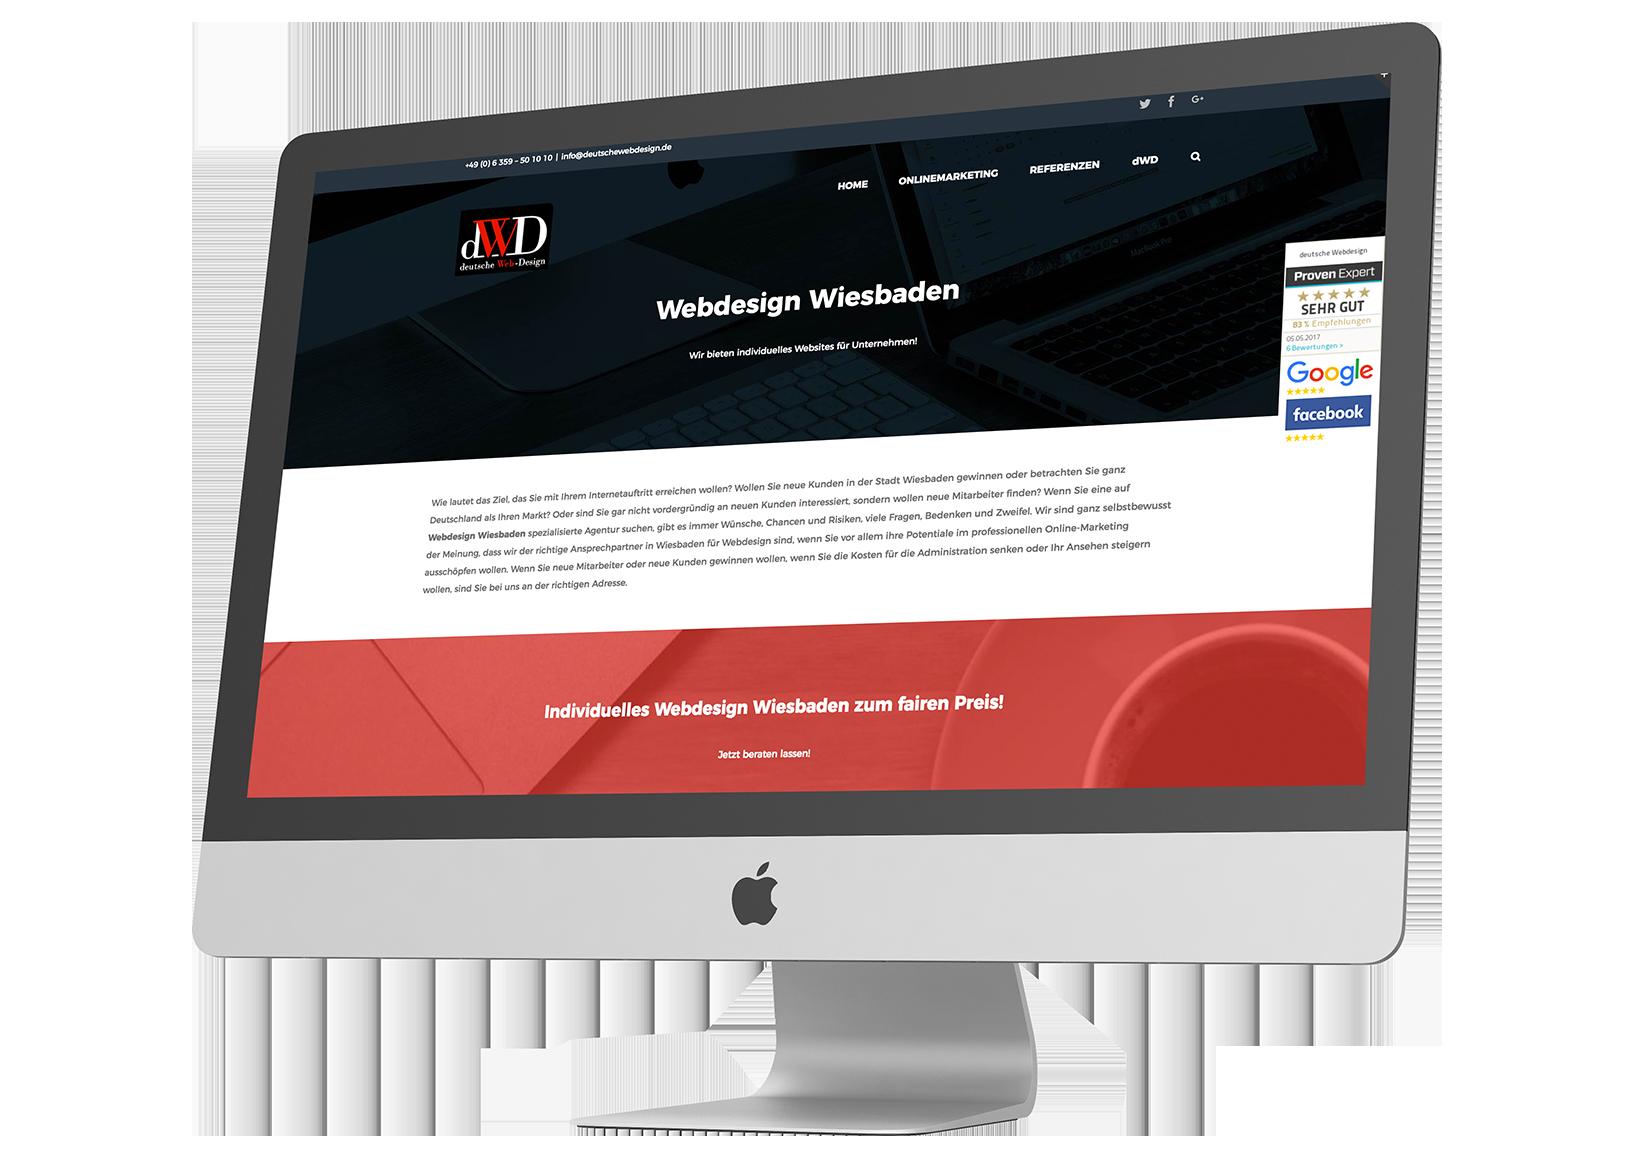 Google Seite 1, Webdesign, Shopsystem, SEO, Suchmaschinenoptimierung, Internetwerbung, Filmproduktion, Imagefilm, Webshopn